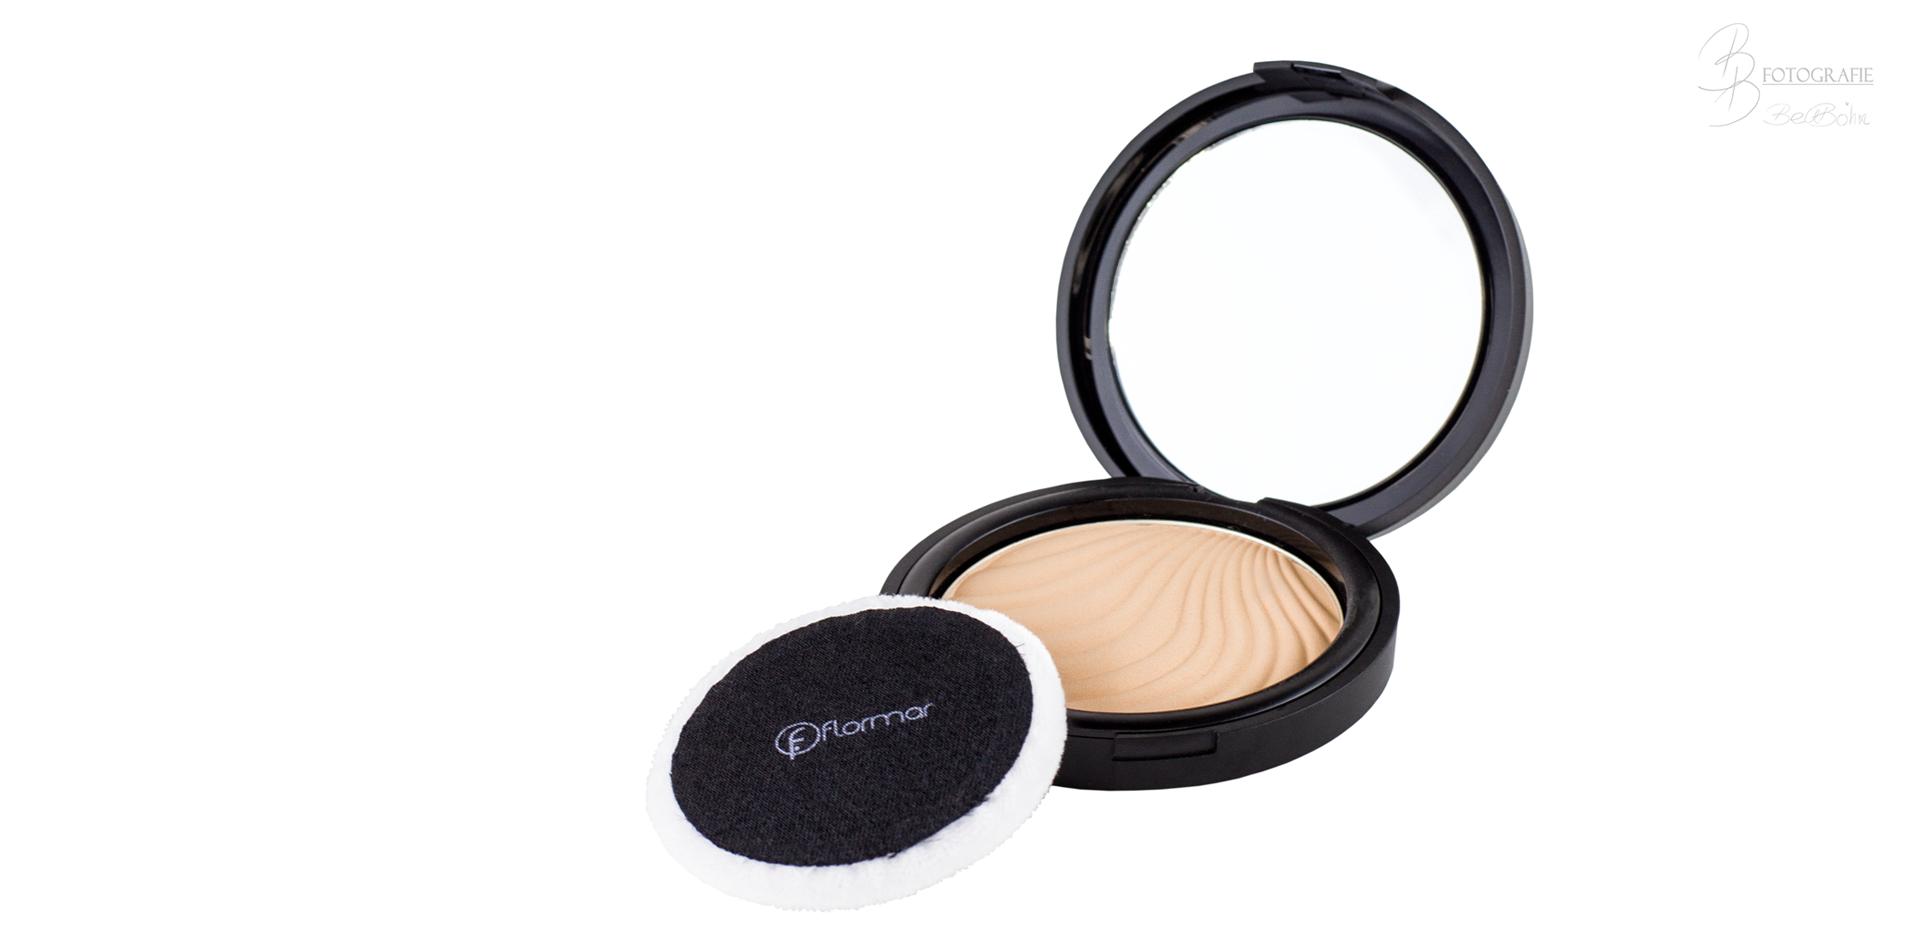 2 Produktfoto Flormar Compact Powder